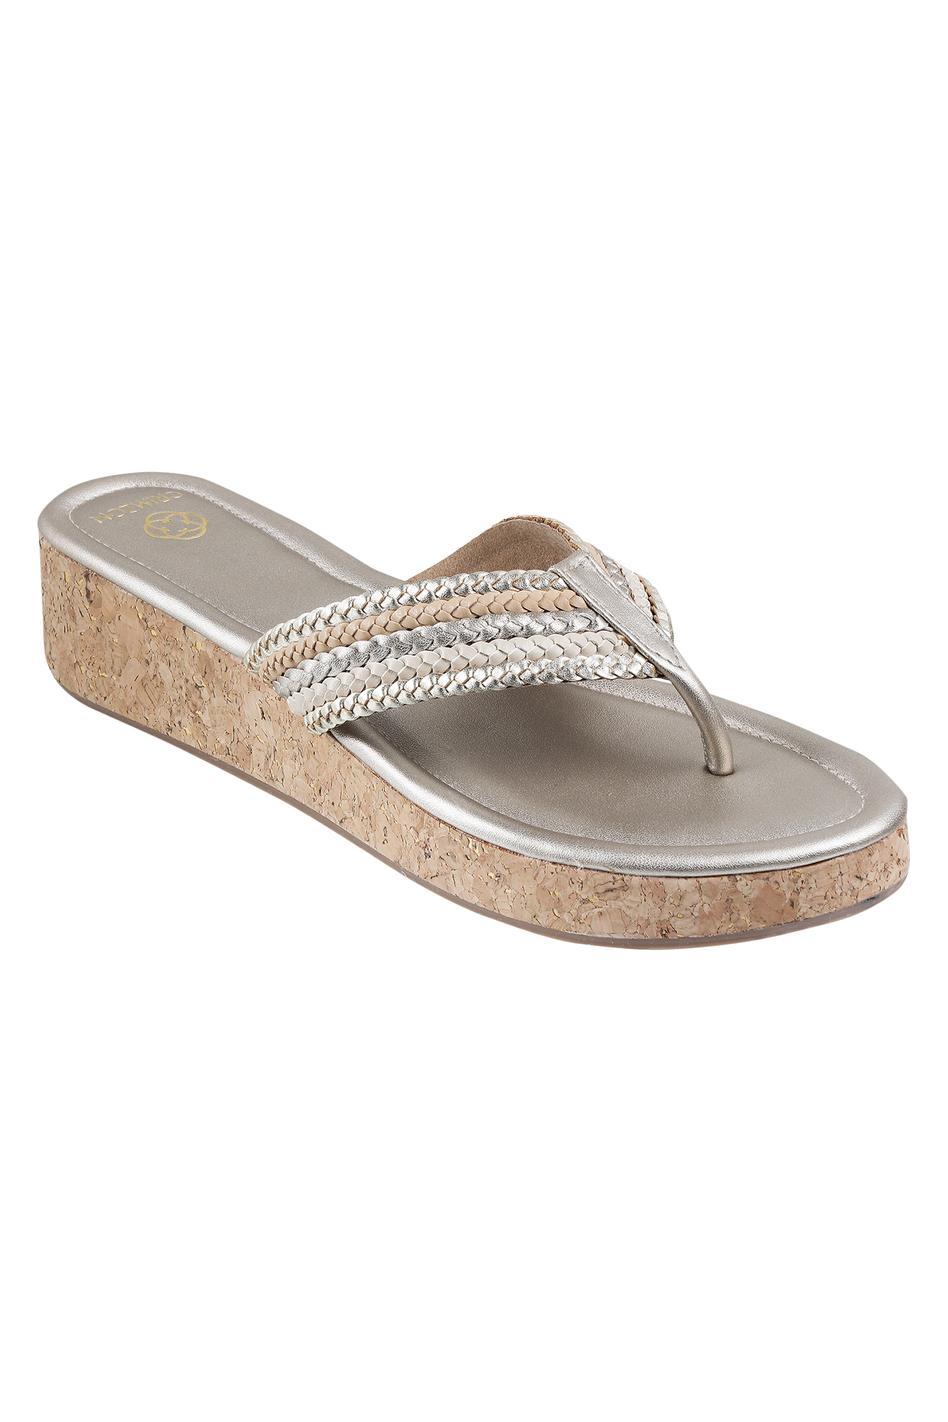 Metallic Braided Platform Heels